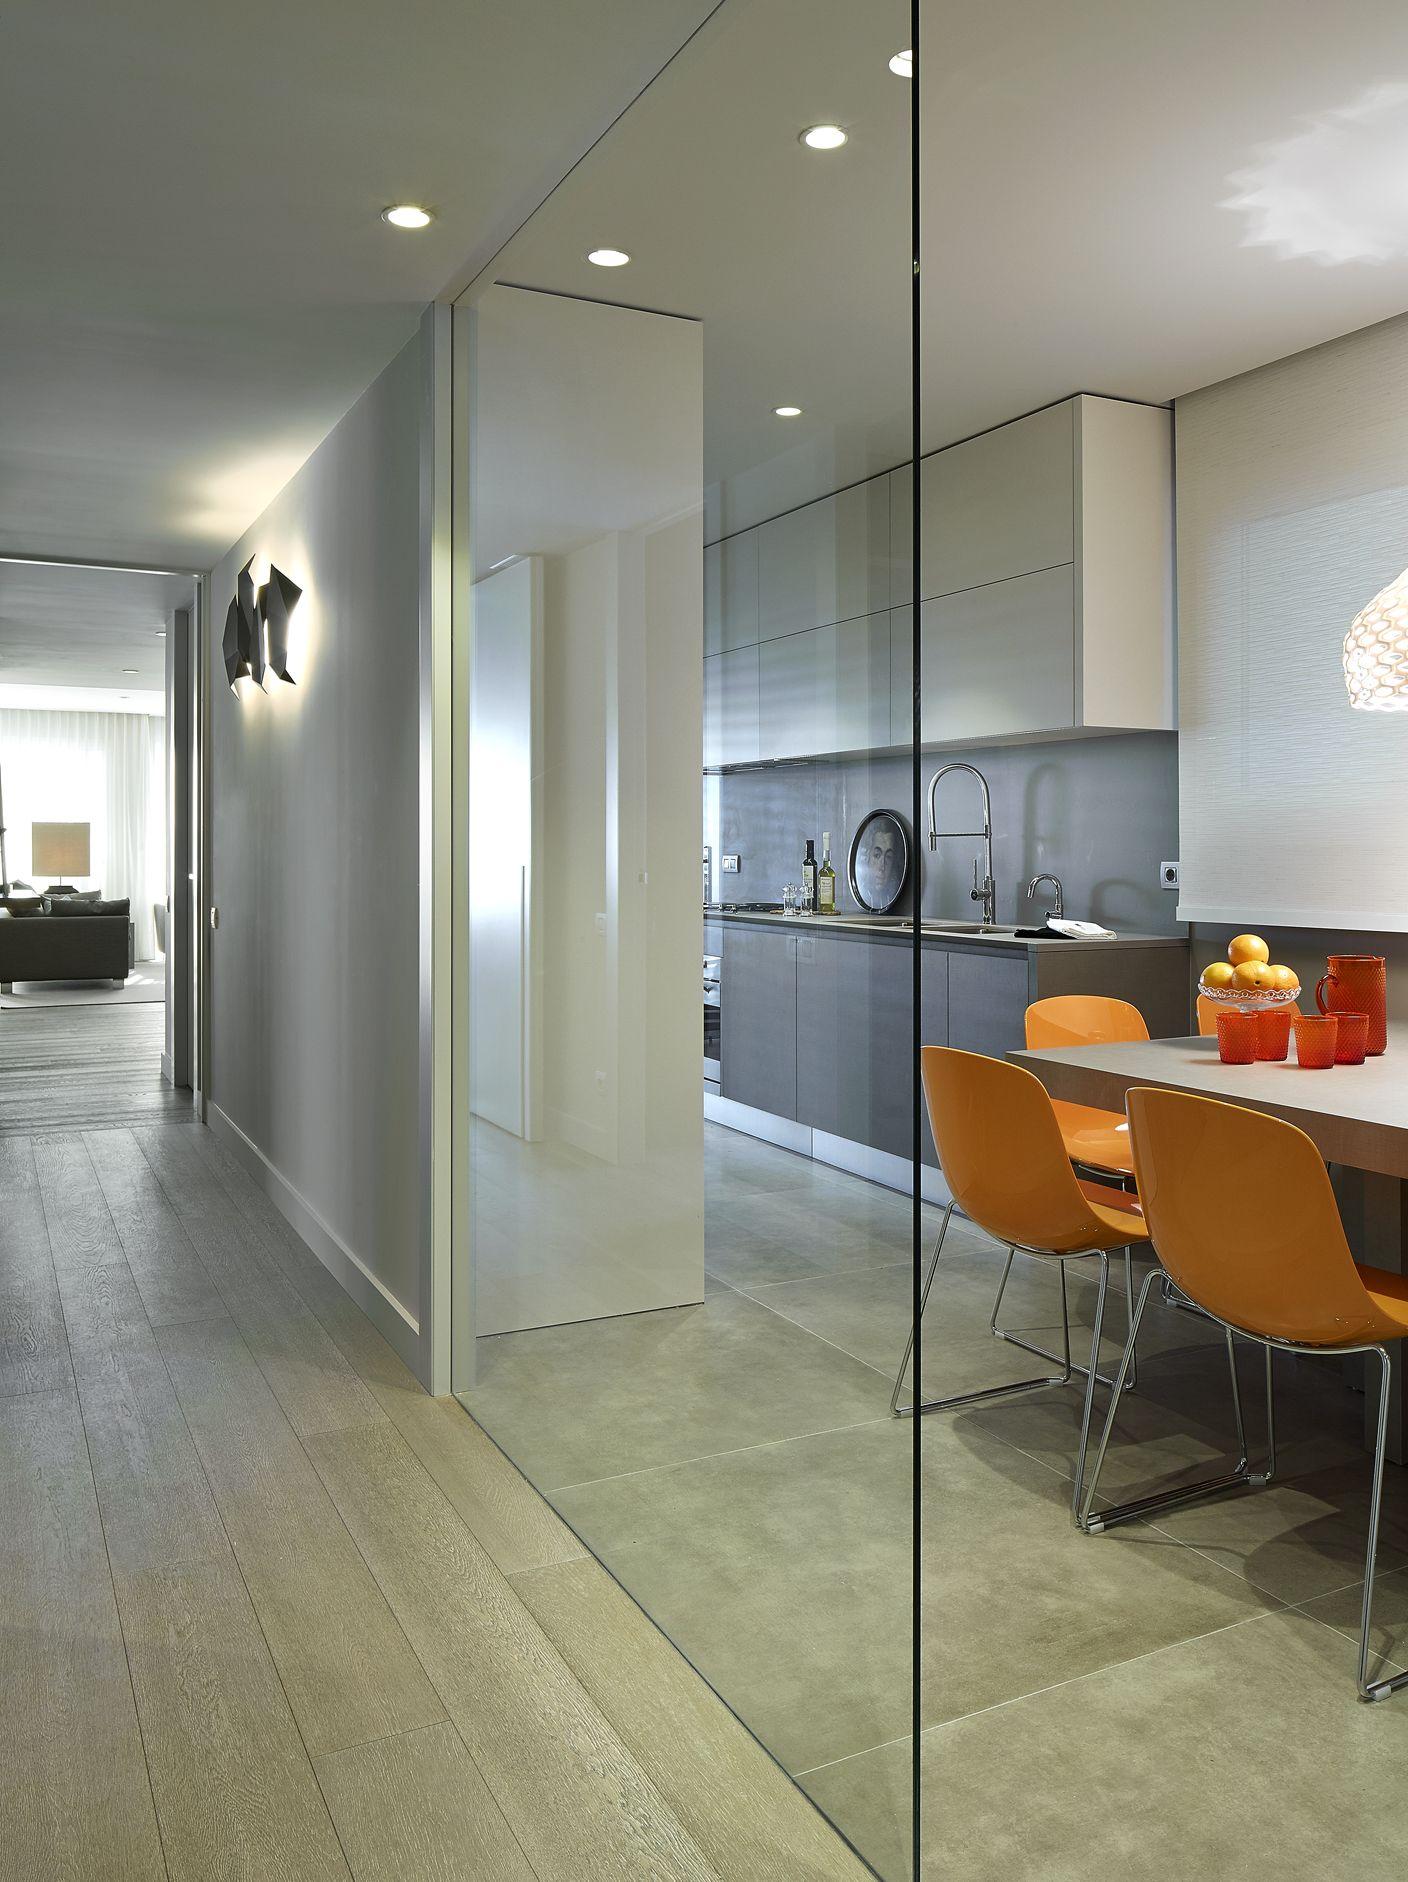 Molins interiors arquitectura interior cocina for Puertas de vidrio para casas